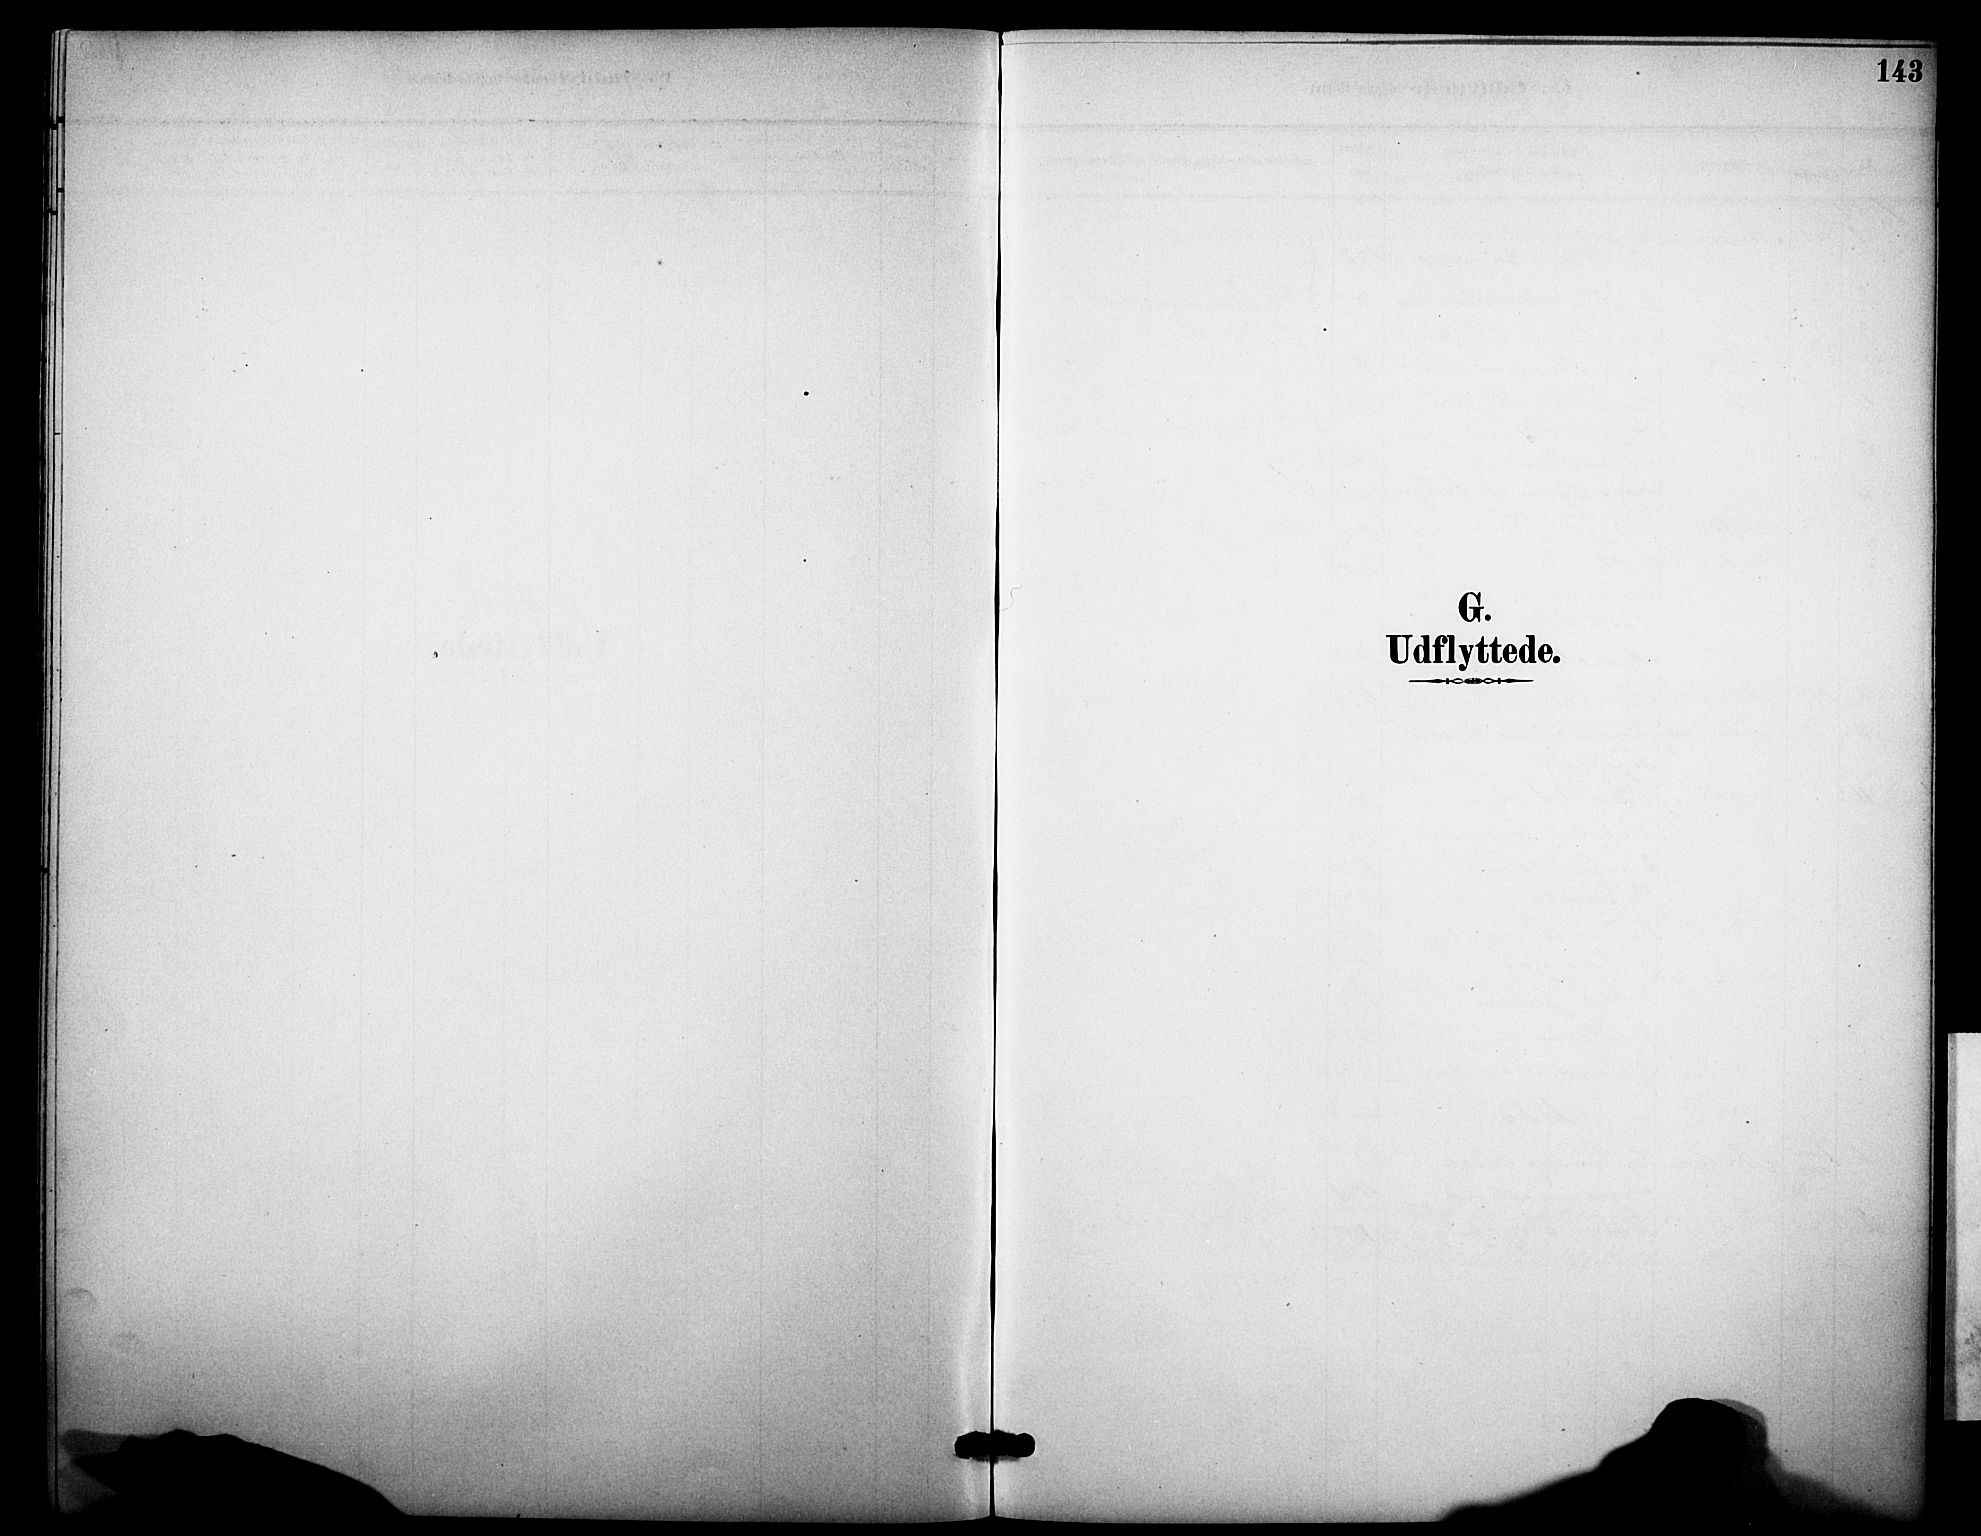 SAKO, Heddal kirkebøker, F/Fb/L0001: Ministerialbok nr. II 1, 1884-1910, s. 143